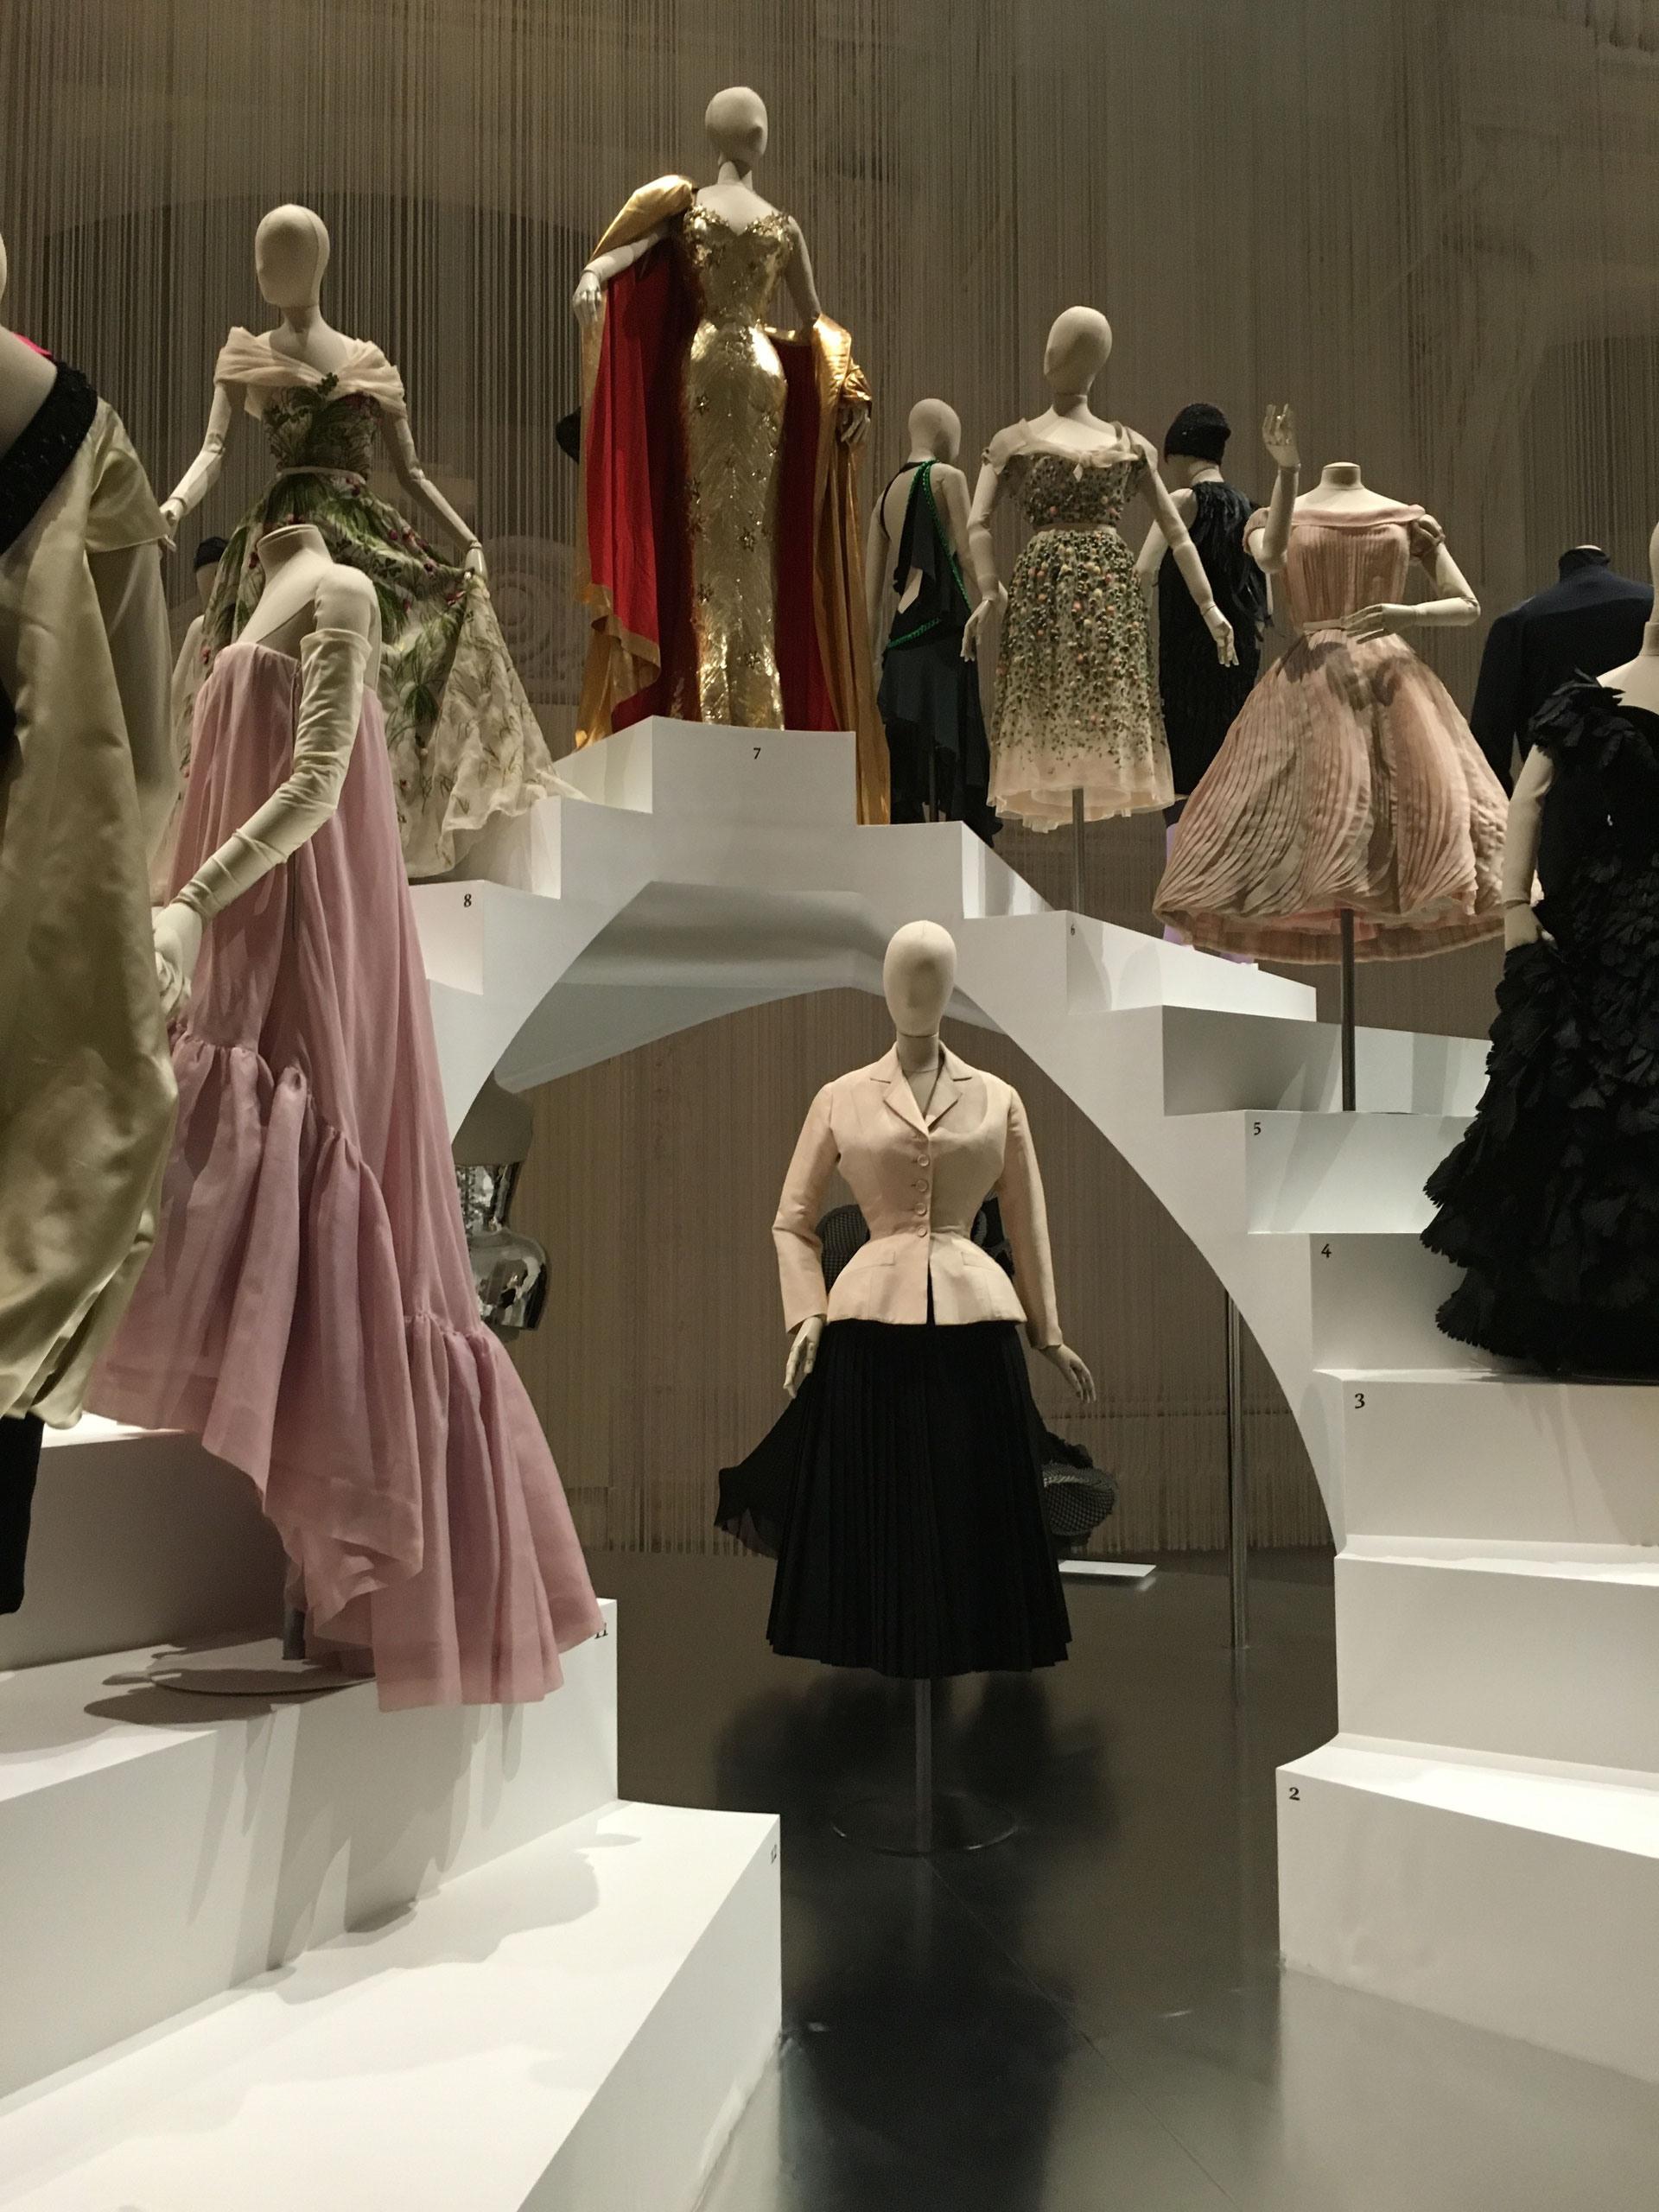 20 Cool Abendkleid Köln BoutiqueDesigner Großartig Abendkleid Köln Vertrieb